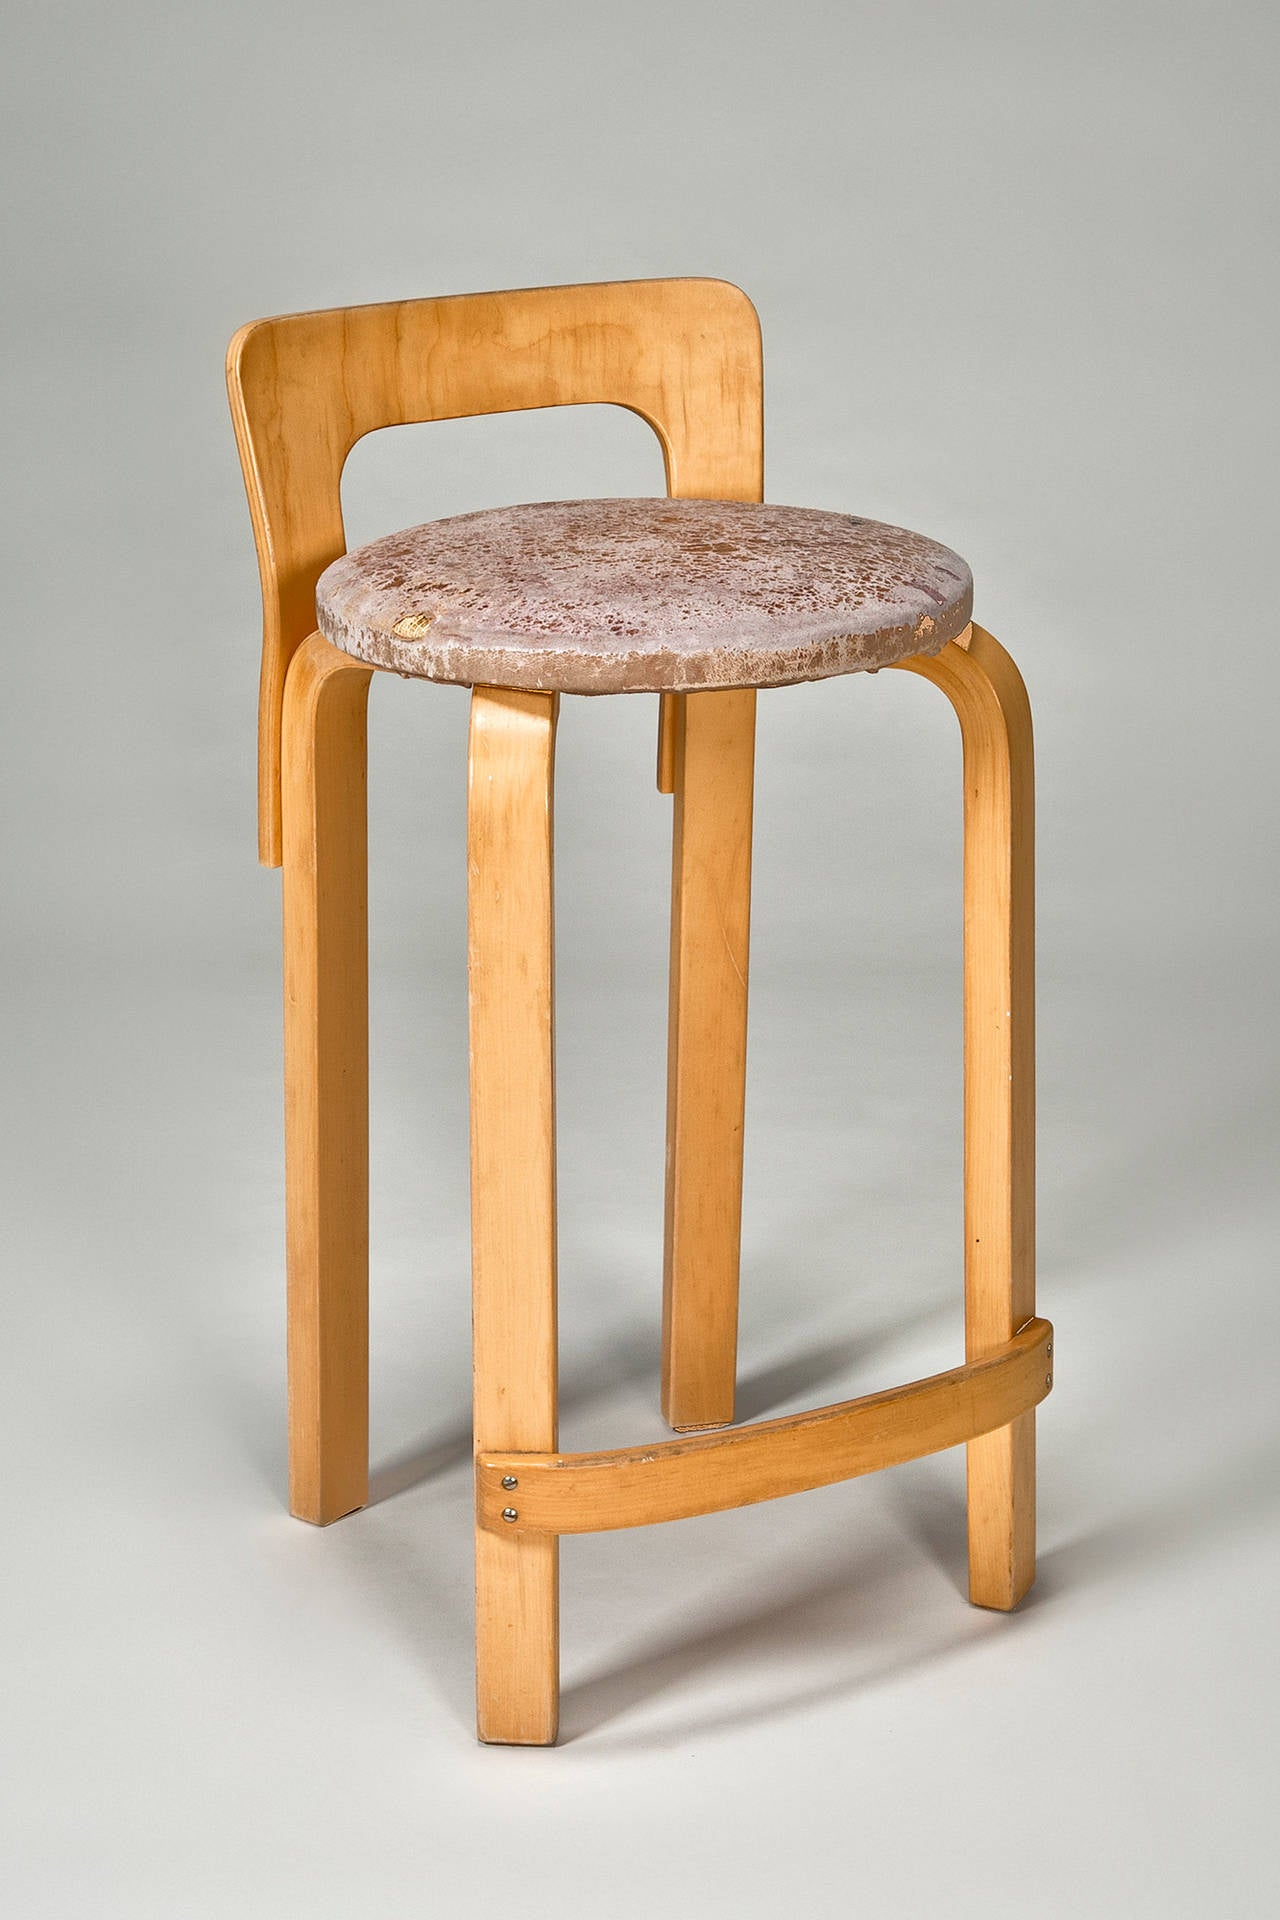 High Chair K65 Set Of 4 By Alvar Aalto From Artek 2nd